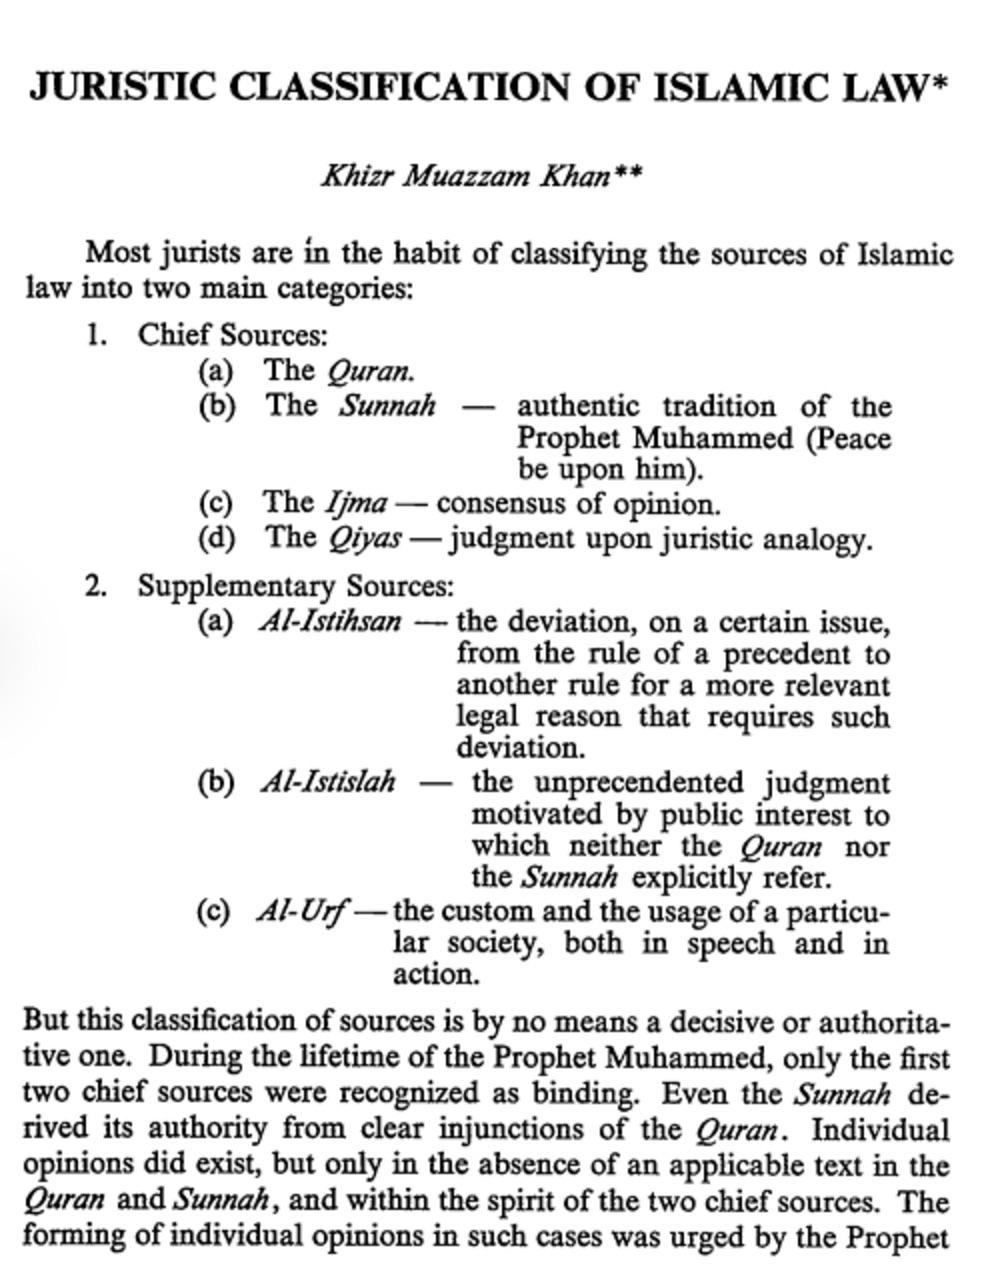 012 Kahn Copy Essay On Islam Awful Persuasive Islamophobia My City Islamabad In Urdu Religion Hindi Full